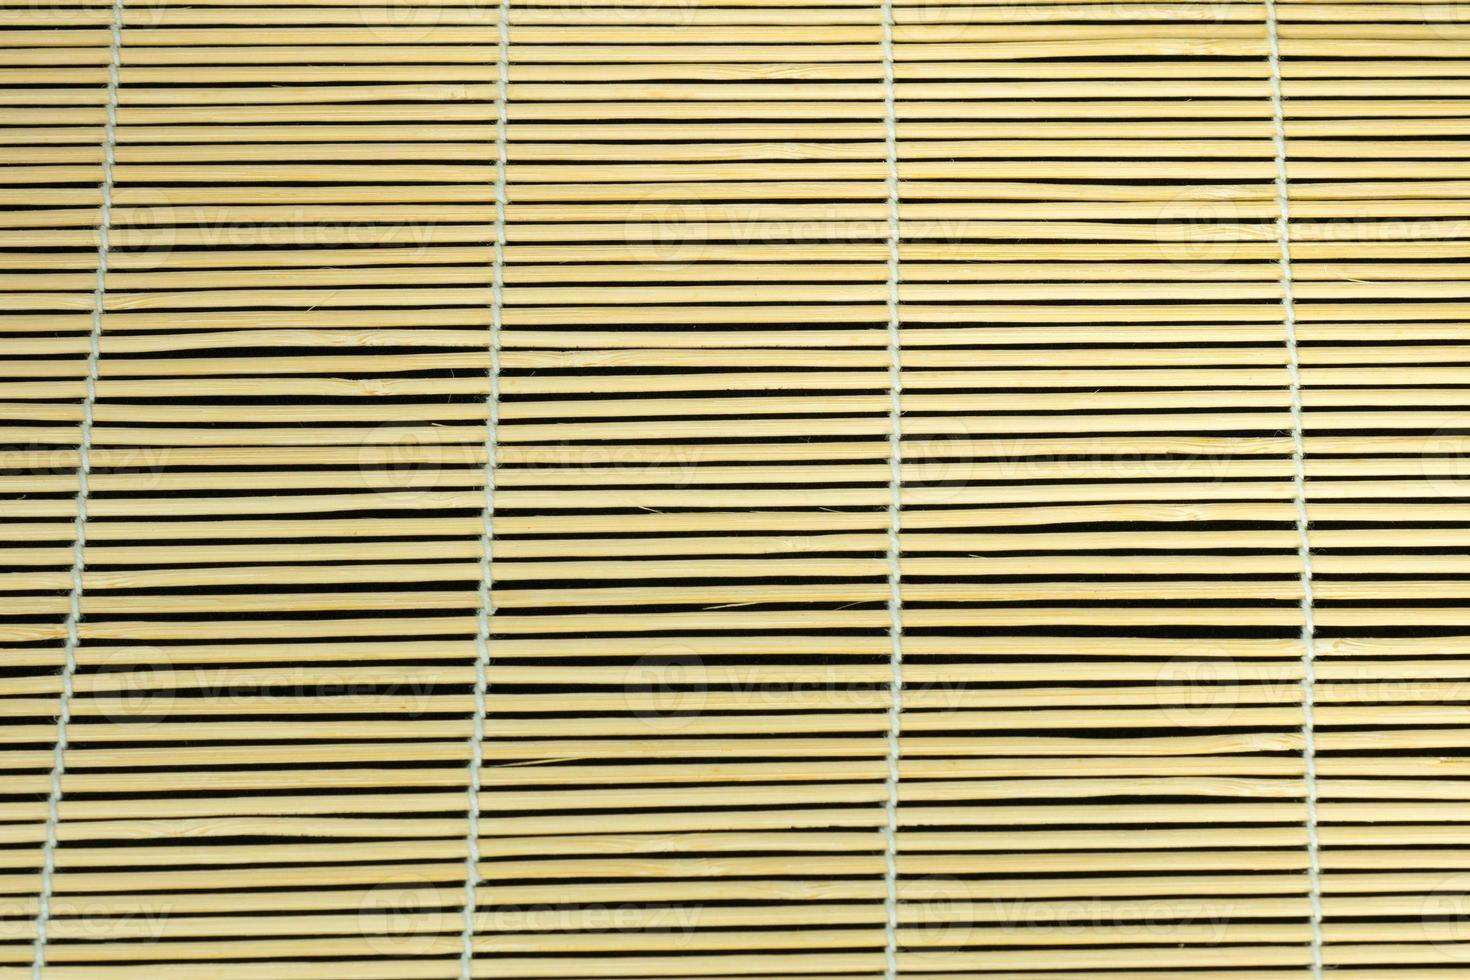 rideau en bambou. photo